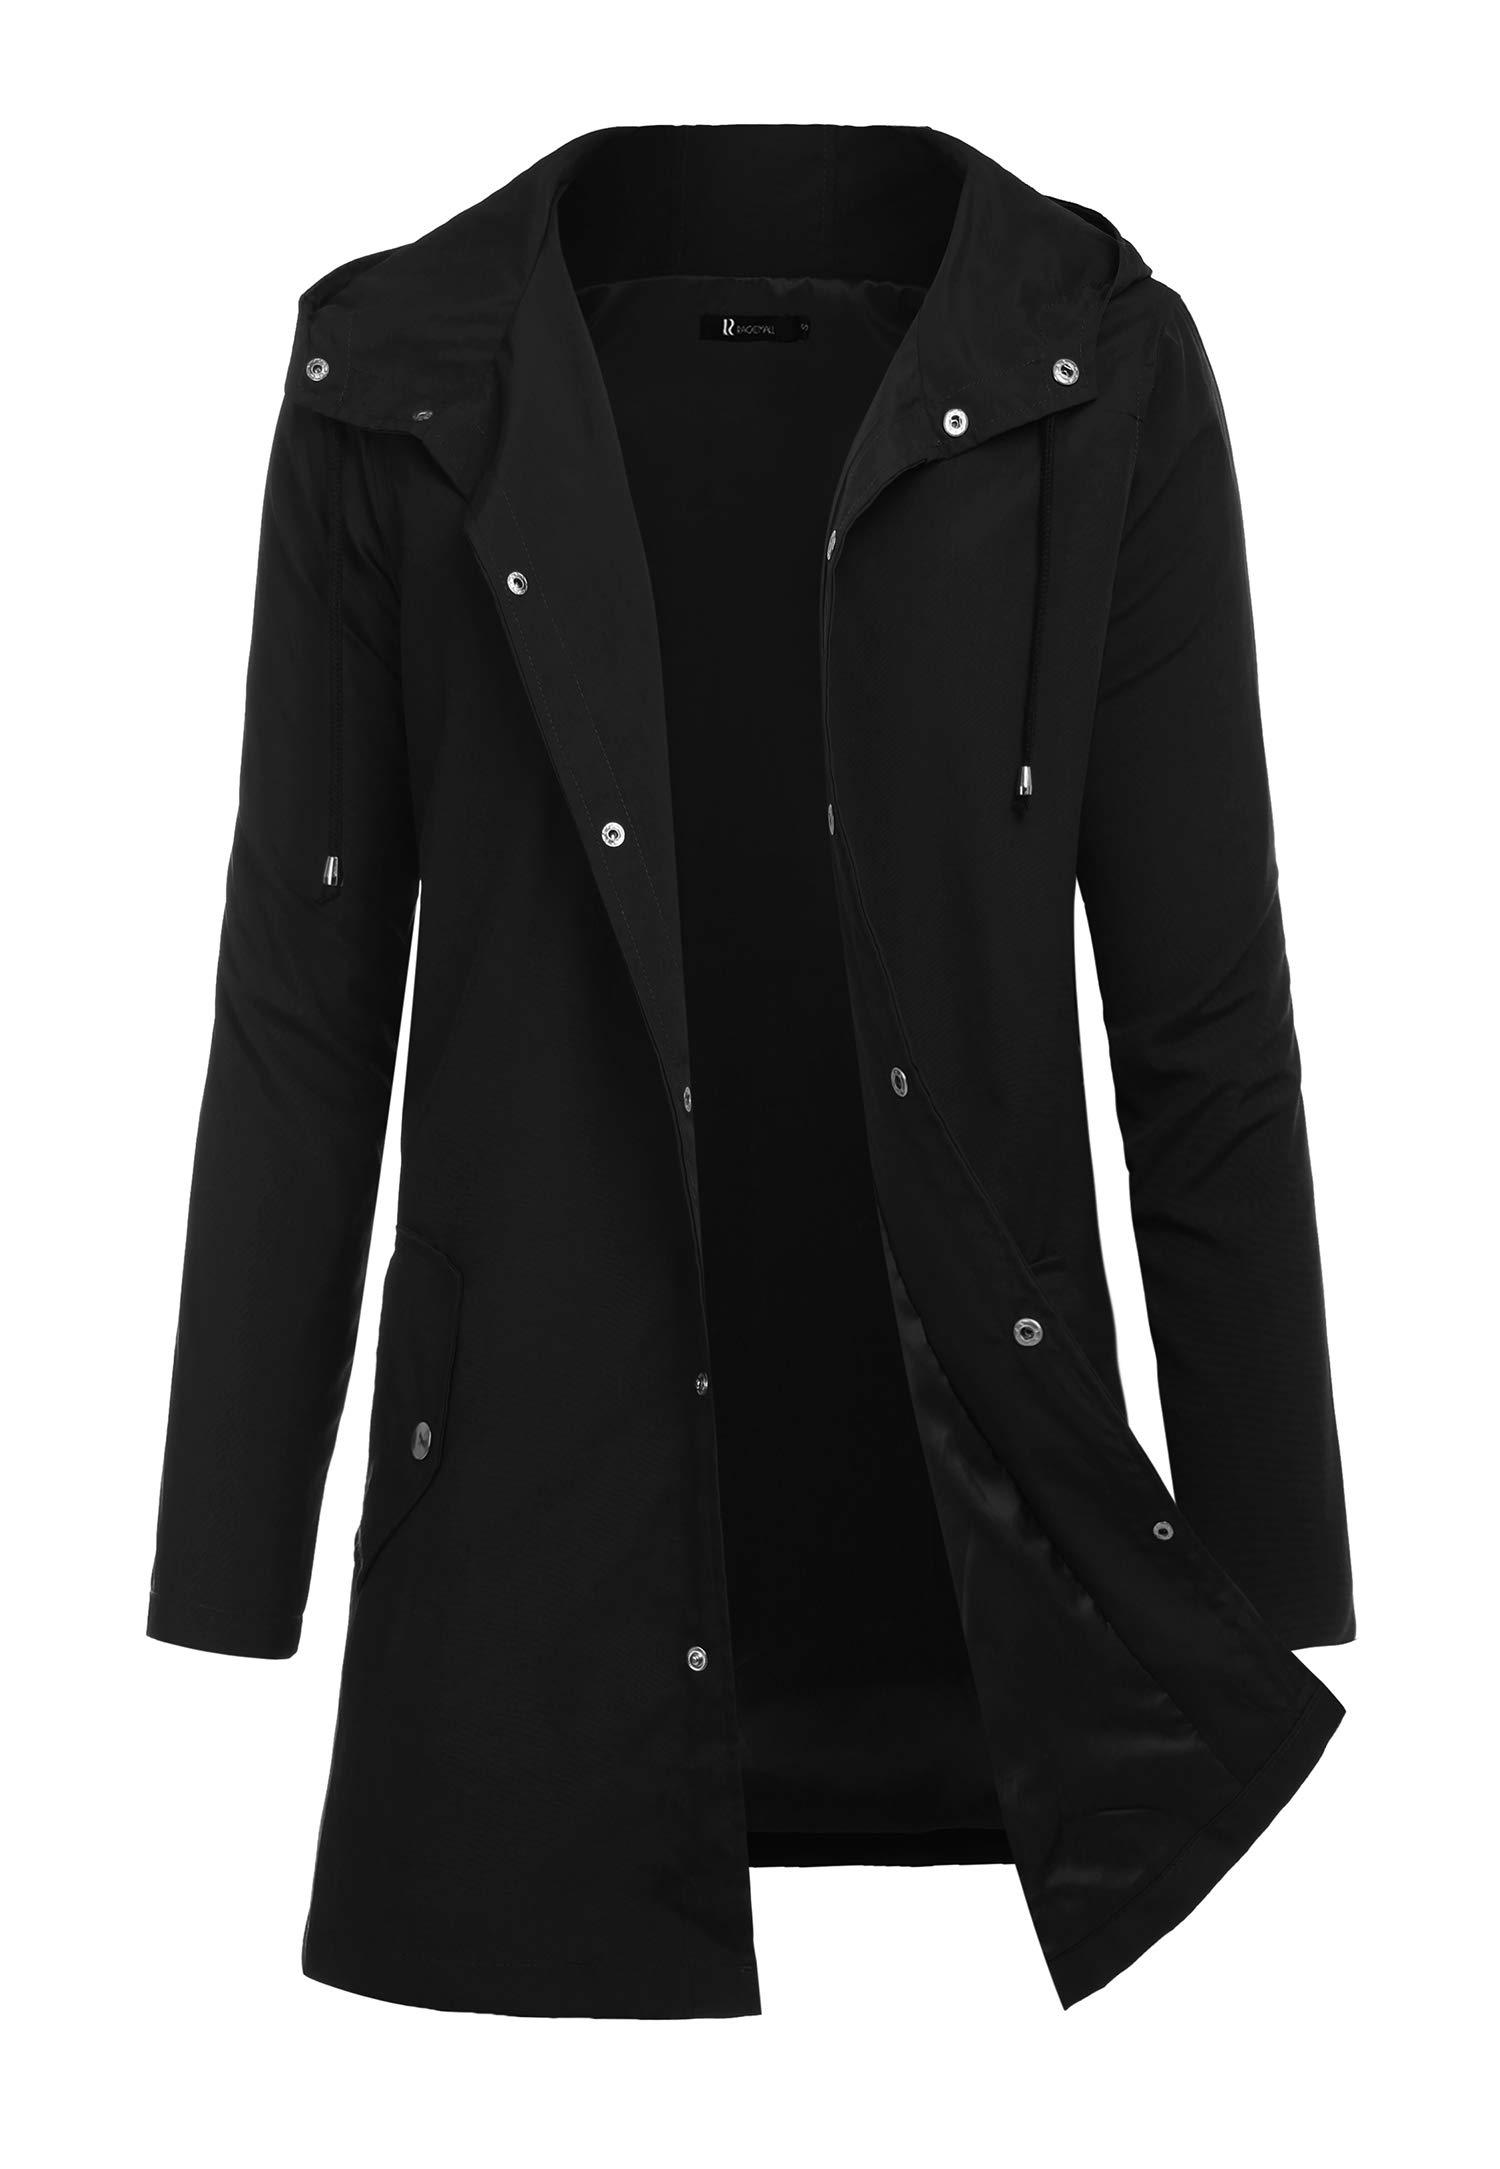 RAGEMALL Men Raincoats Waterproof Jacket with Hood Active Outdoor Long Windbreaker Lightweight Rain Jacket for Men Black XXL by RAGEMALL